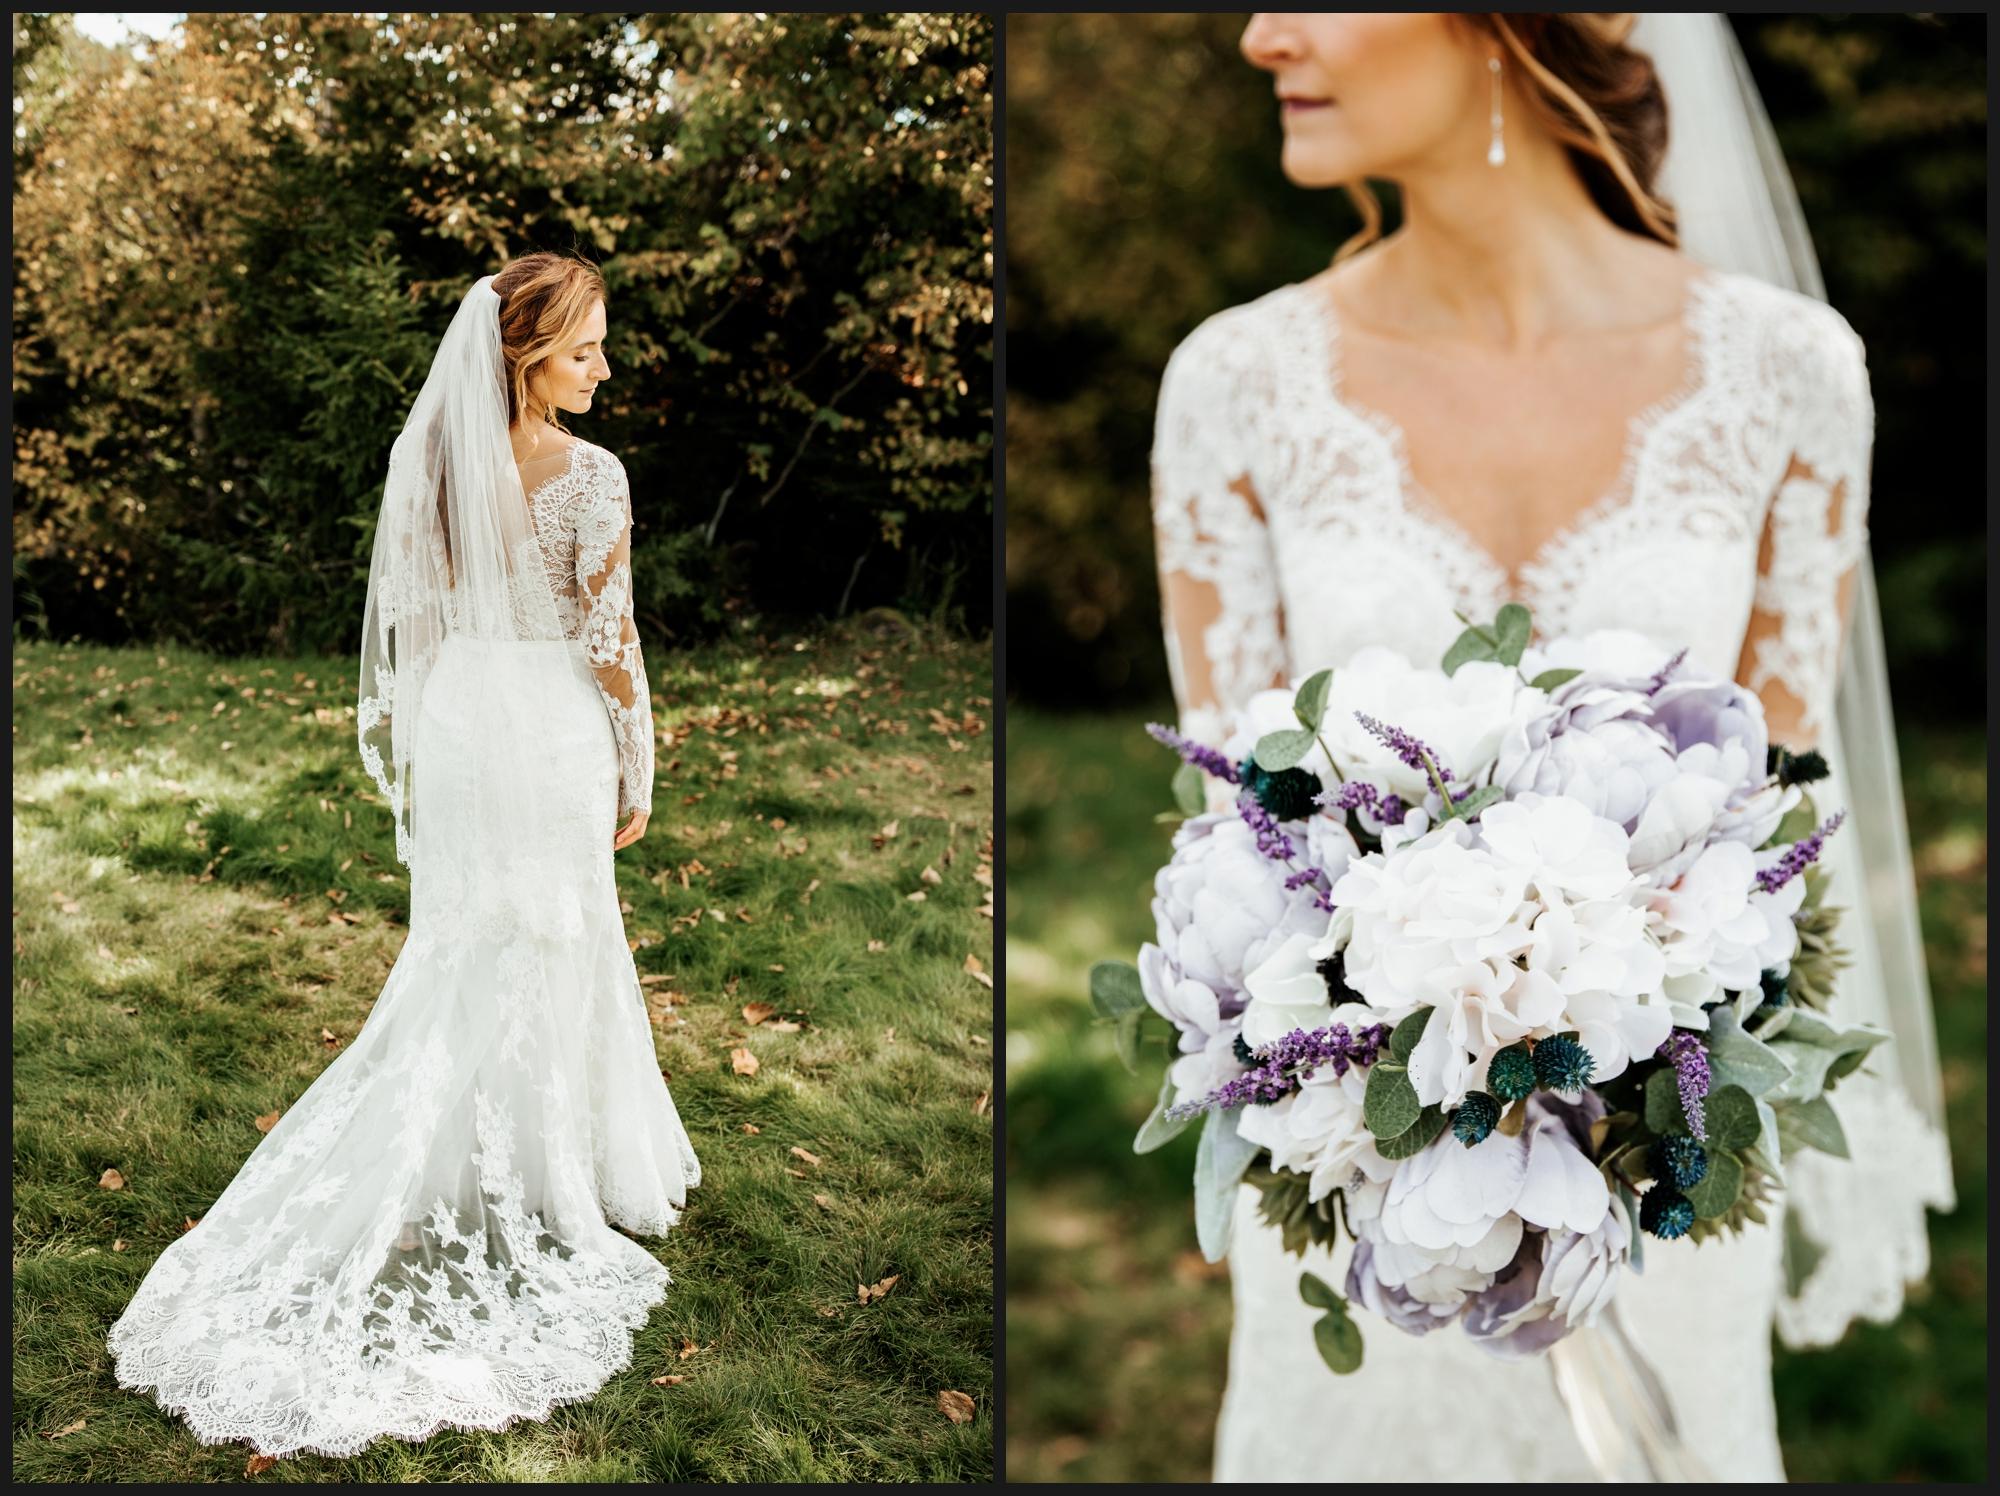 Orlando-Wedding-Photographer-destination-wedding-photographer-florida-wedding-photographer-hawaii-wedding-photographer_0108.jpg